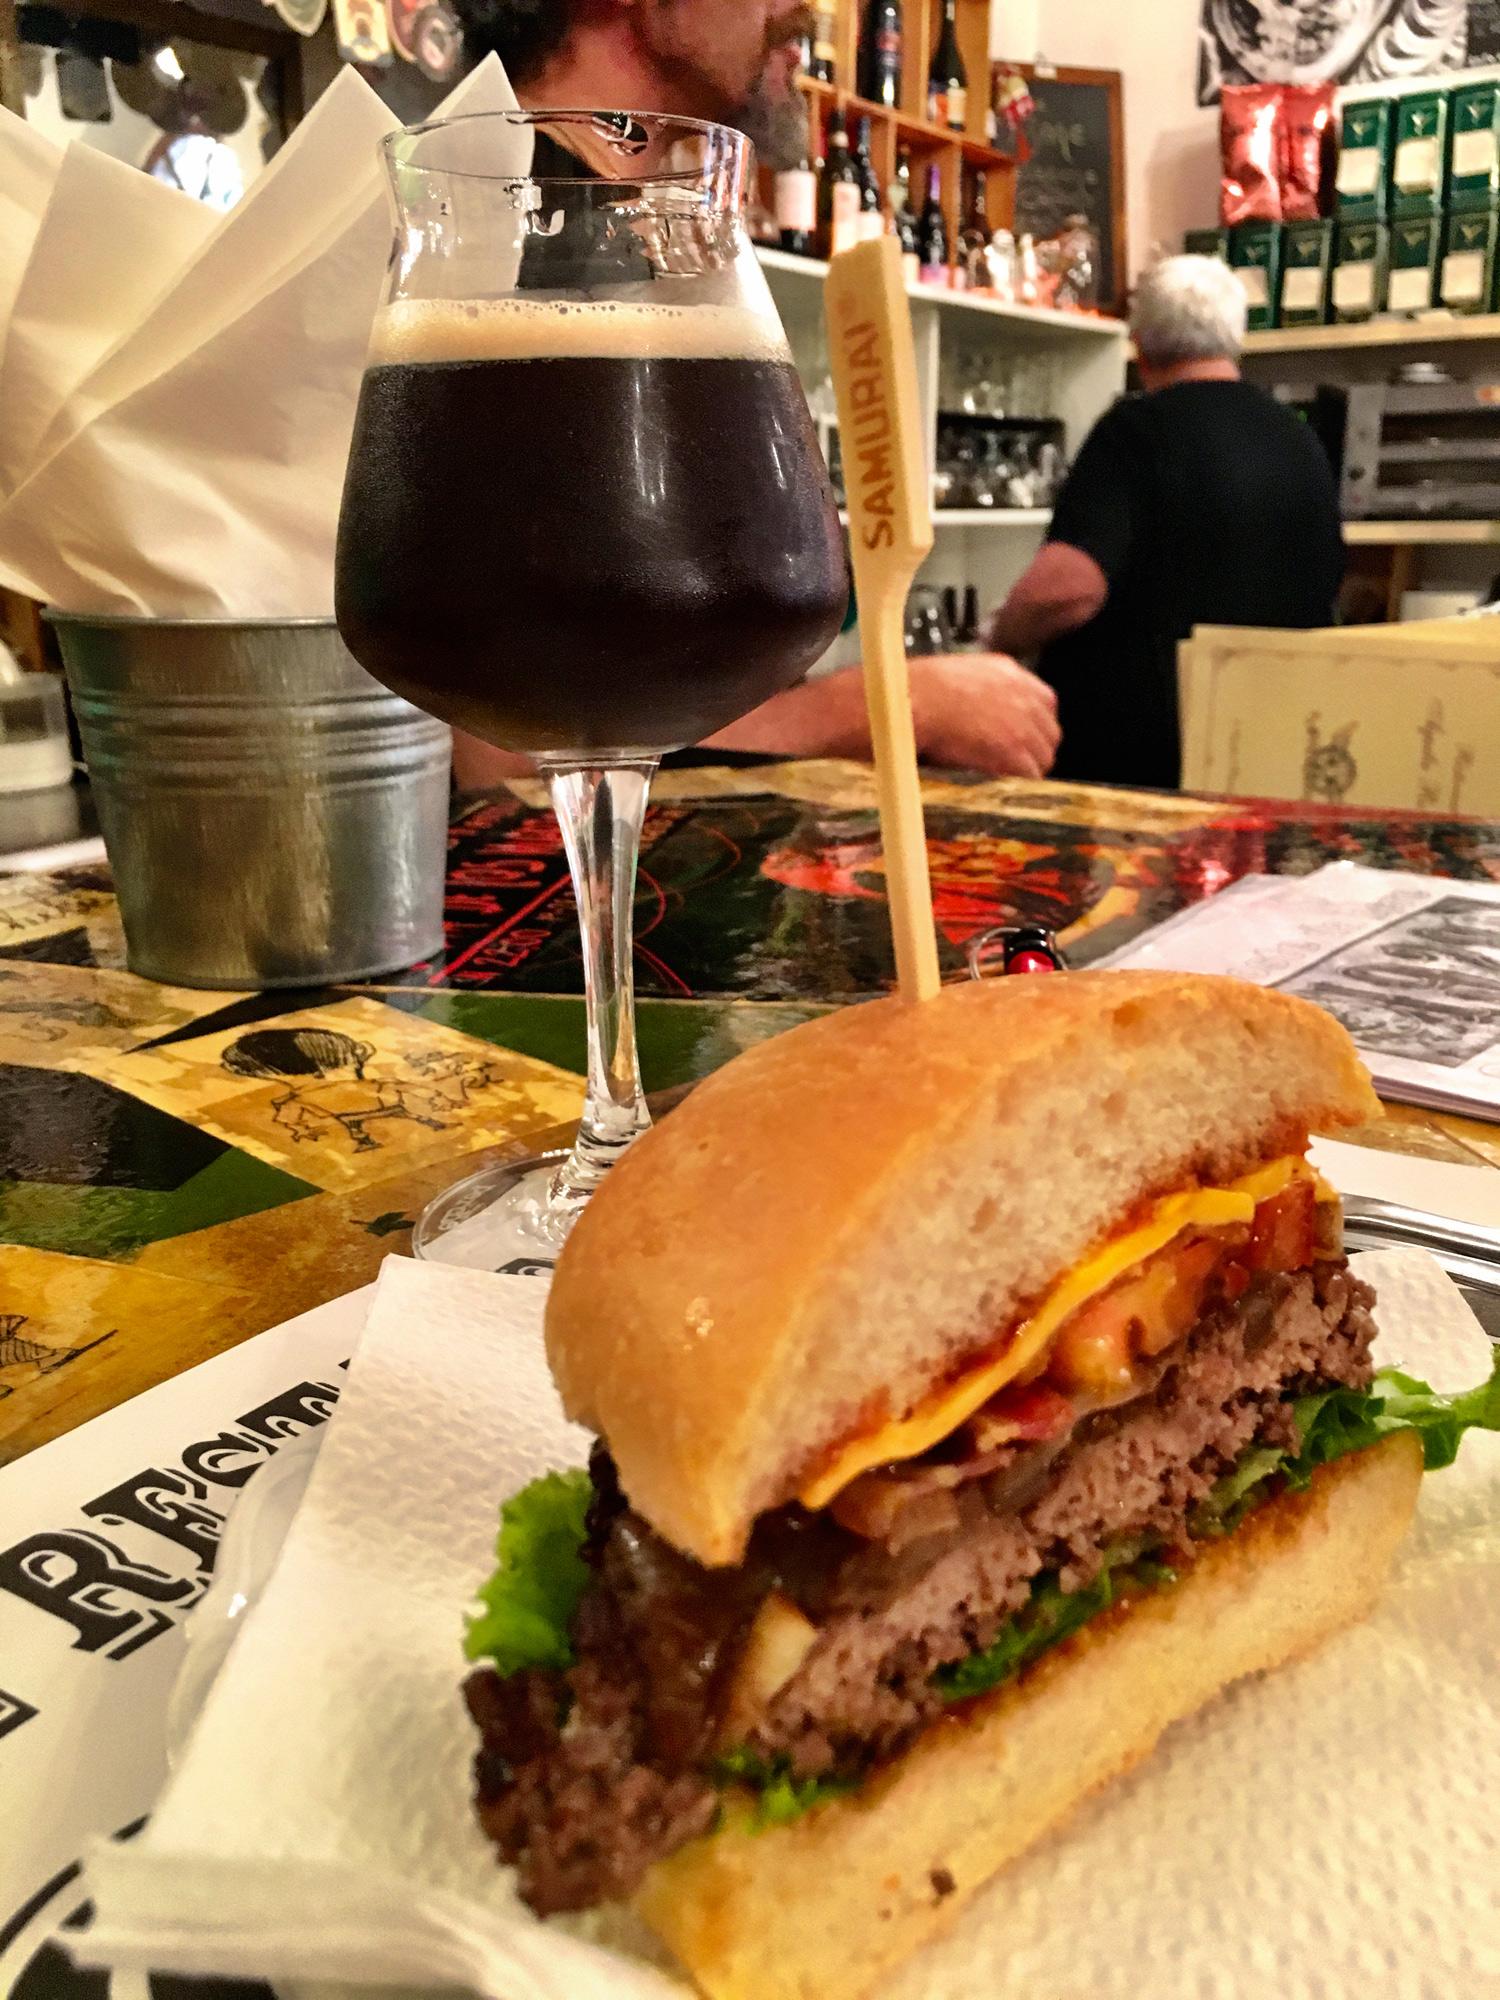 Beerburger e stout artigianale al 19.28 | ©foto Paolo Lottero